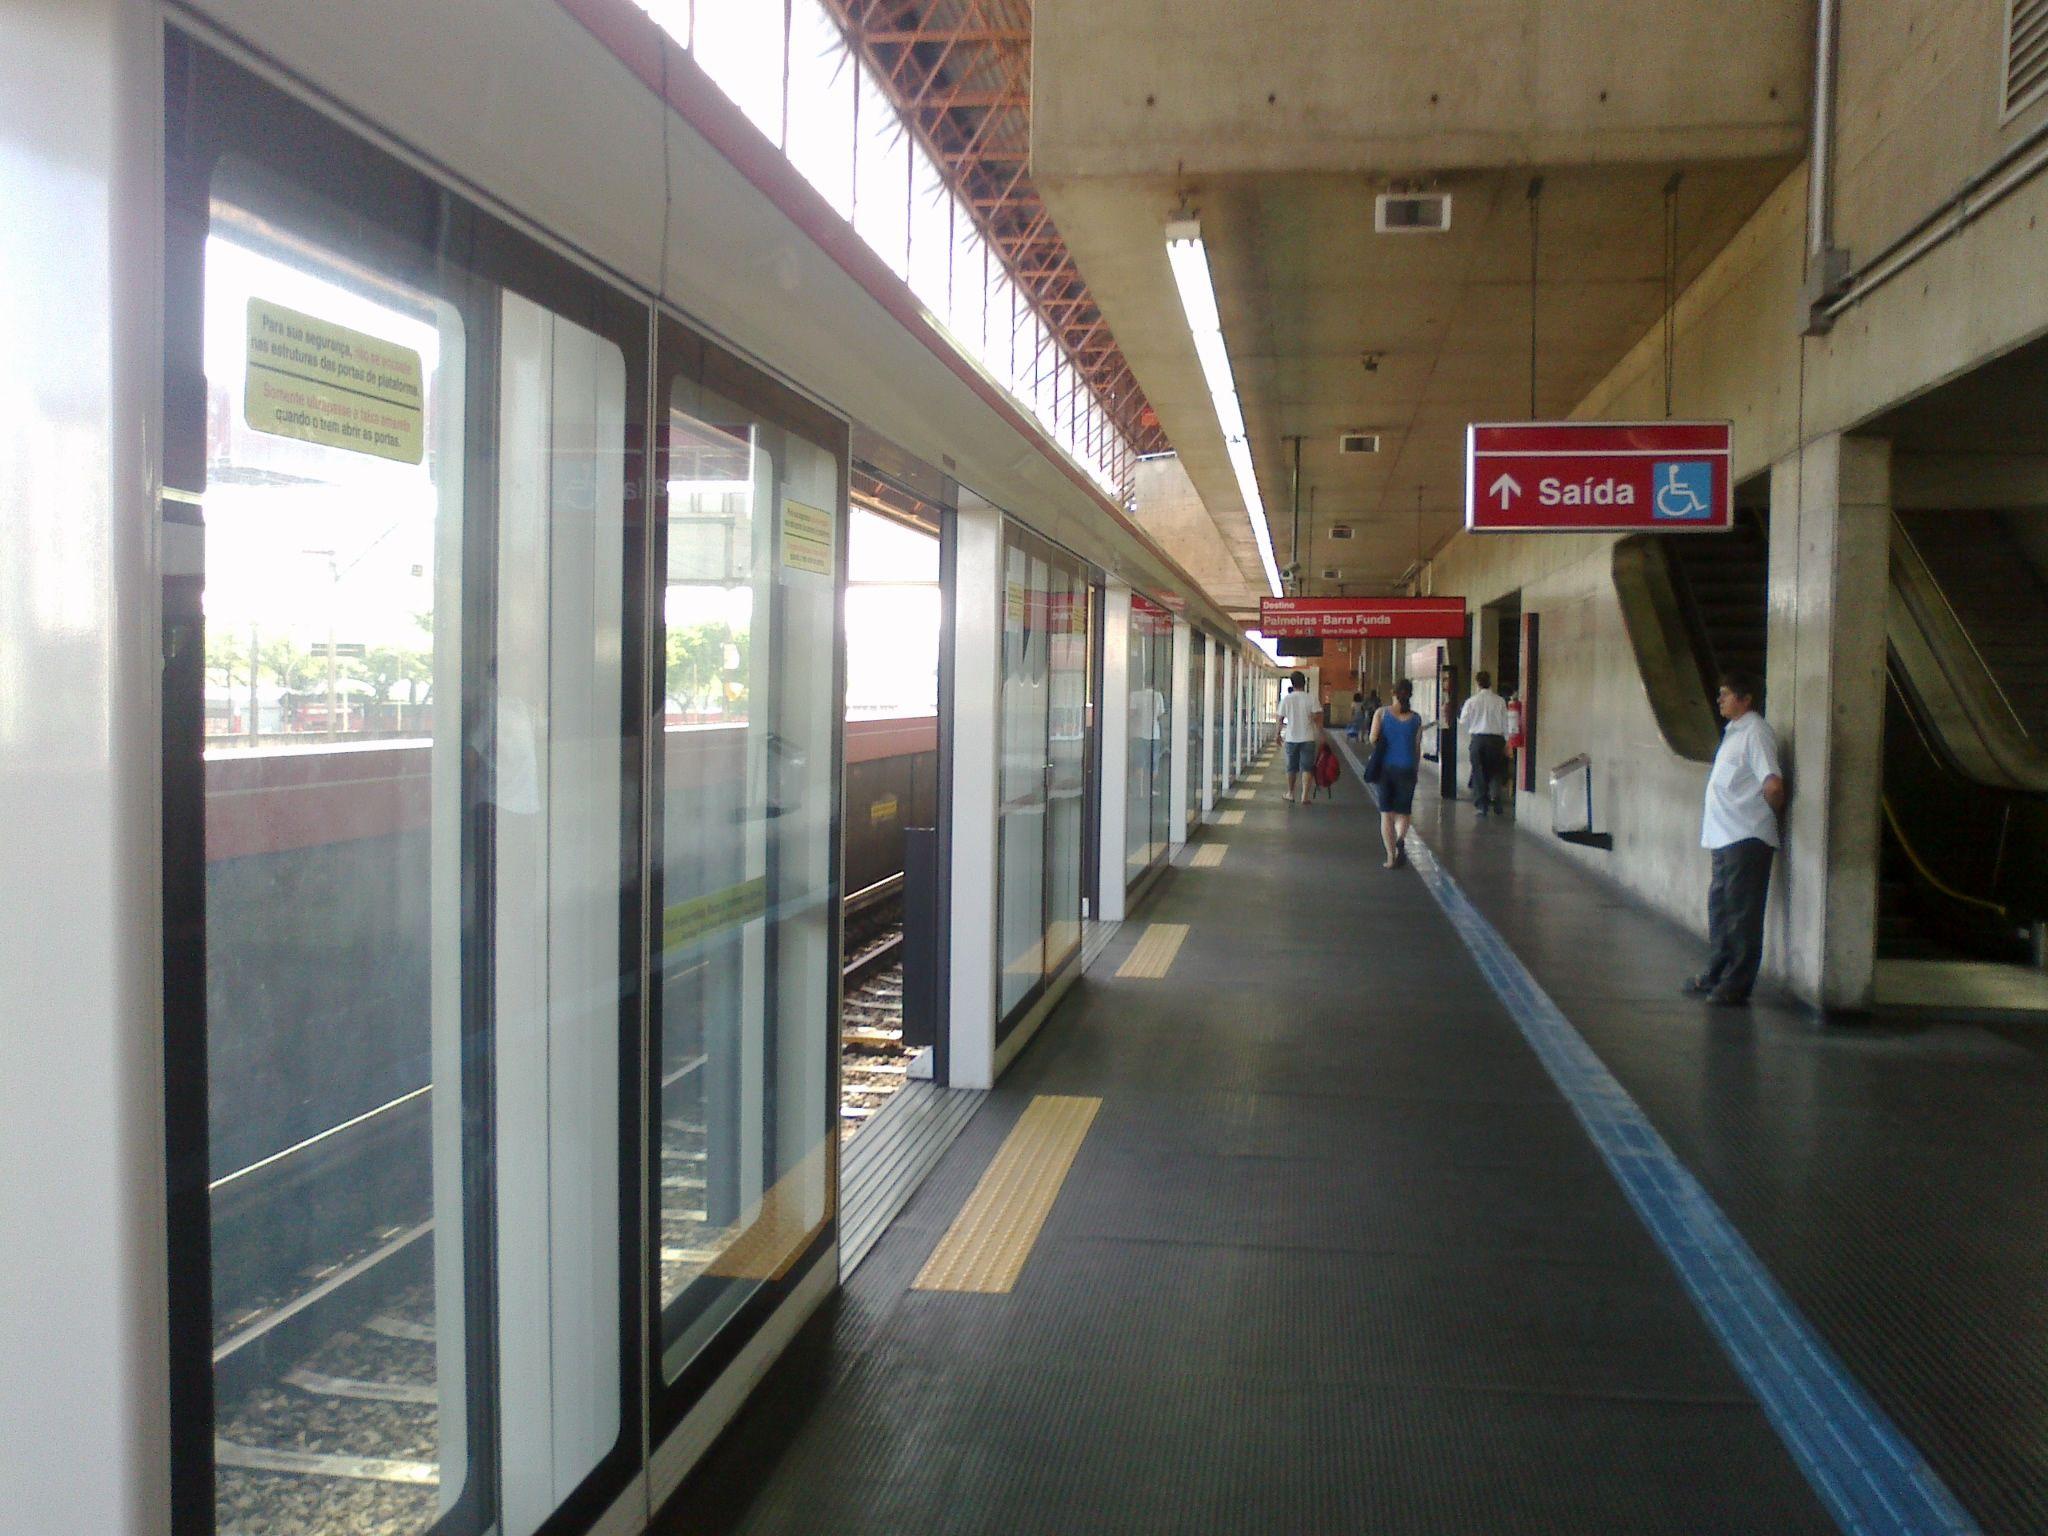 Estação Vila Matilde #metro #subway #urban #saopaulo #sampa #sp #railway #igers #igersbrasil #igerssaopaulo #instasampa #instadroid #metrosp